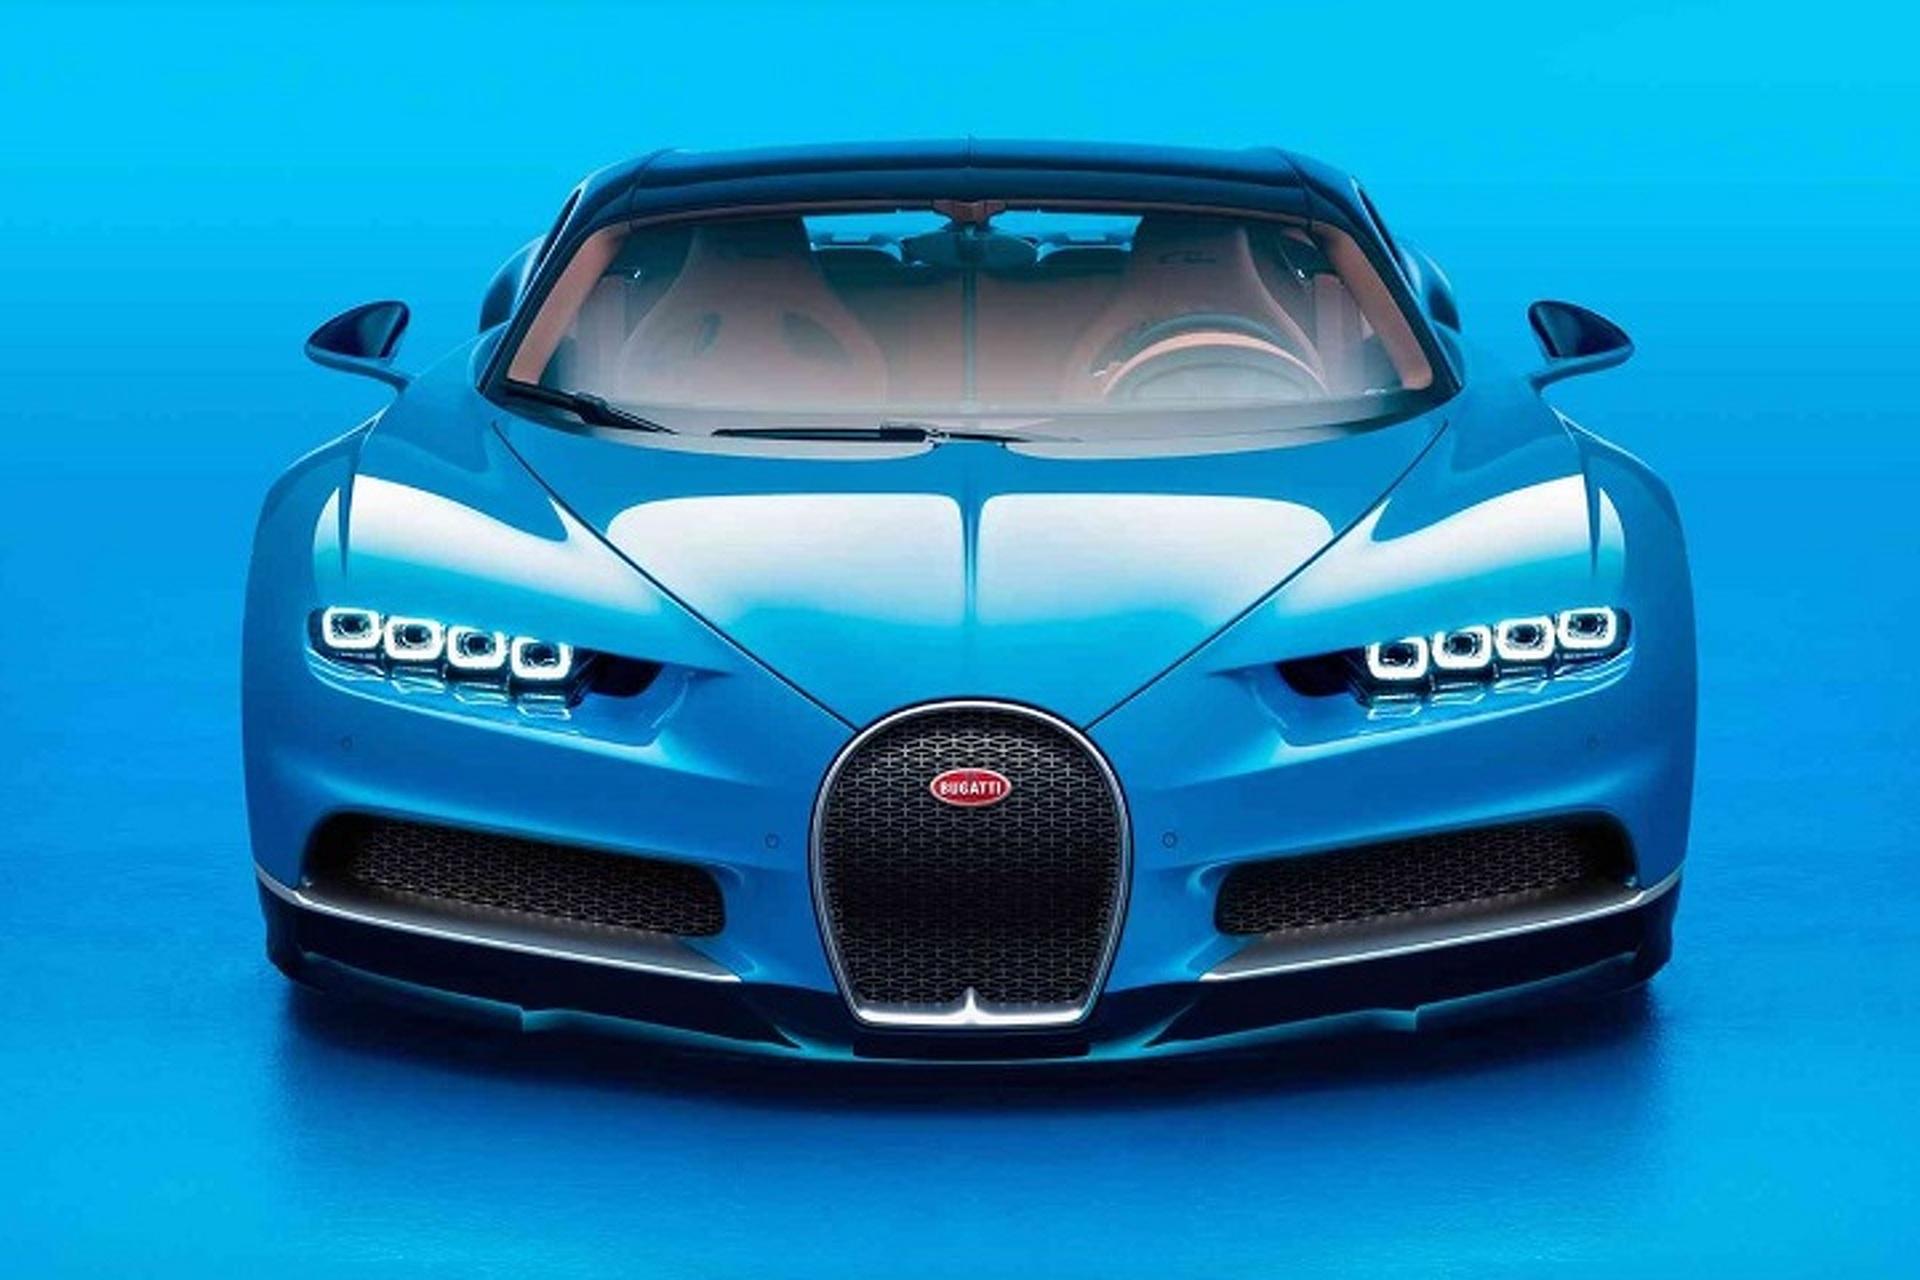 The Bugatti Chiron Almost Had a Completely Different Design